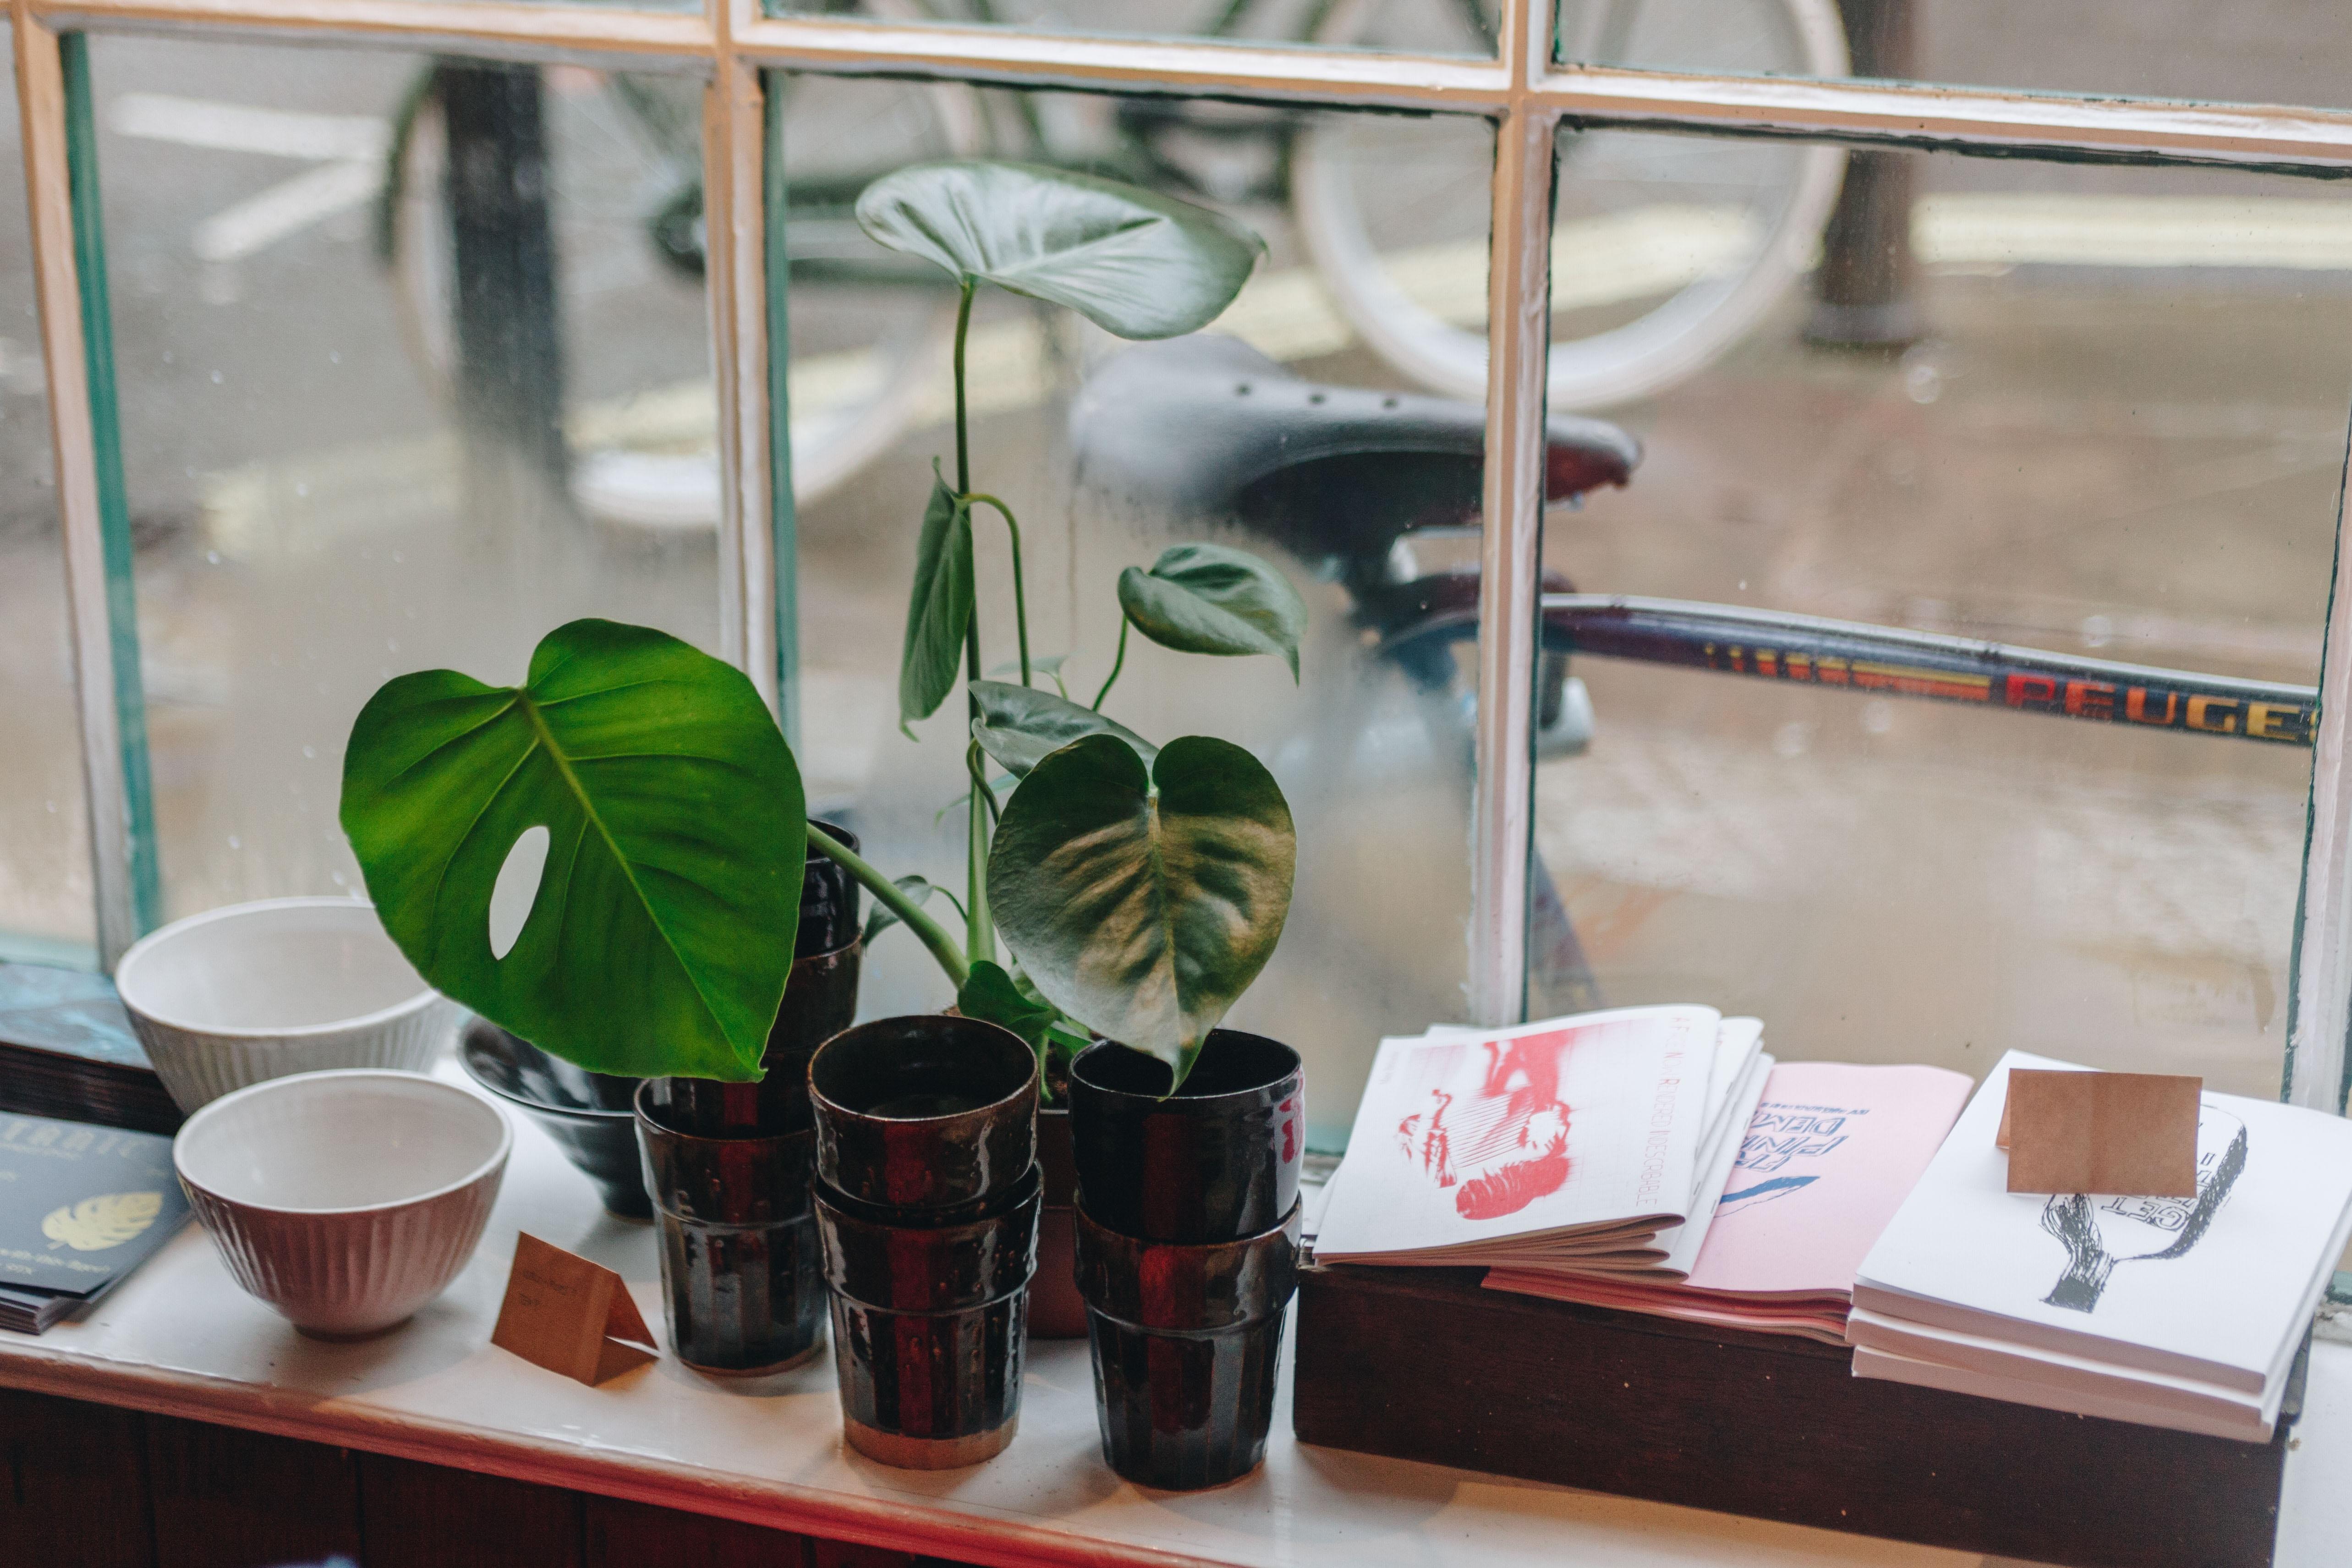 green plants beside white ceramic bowls